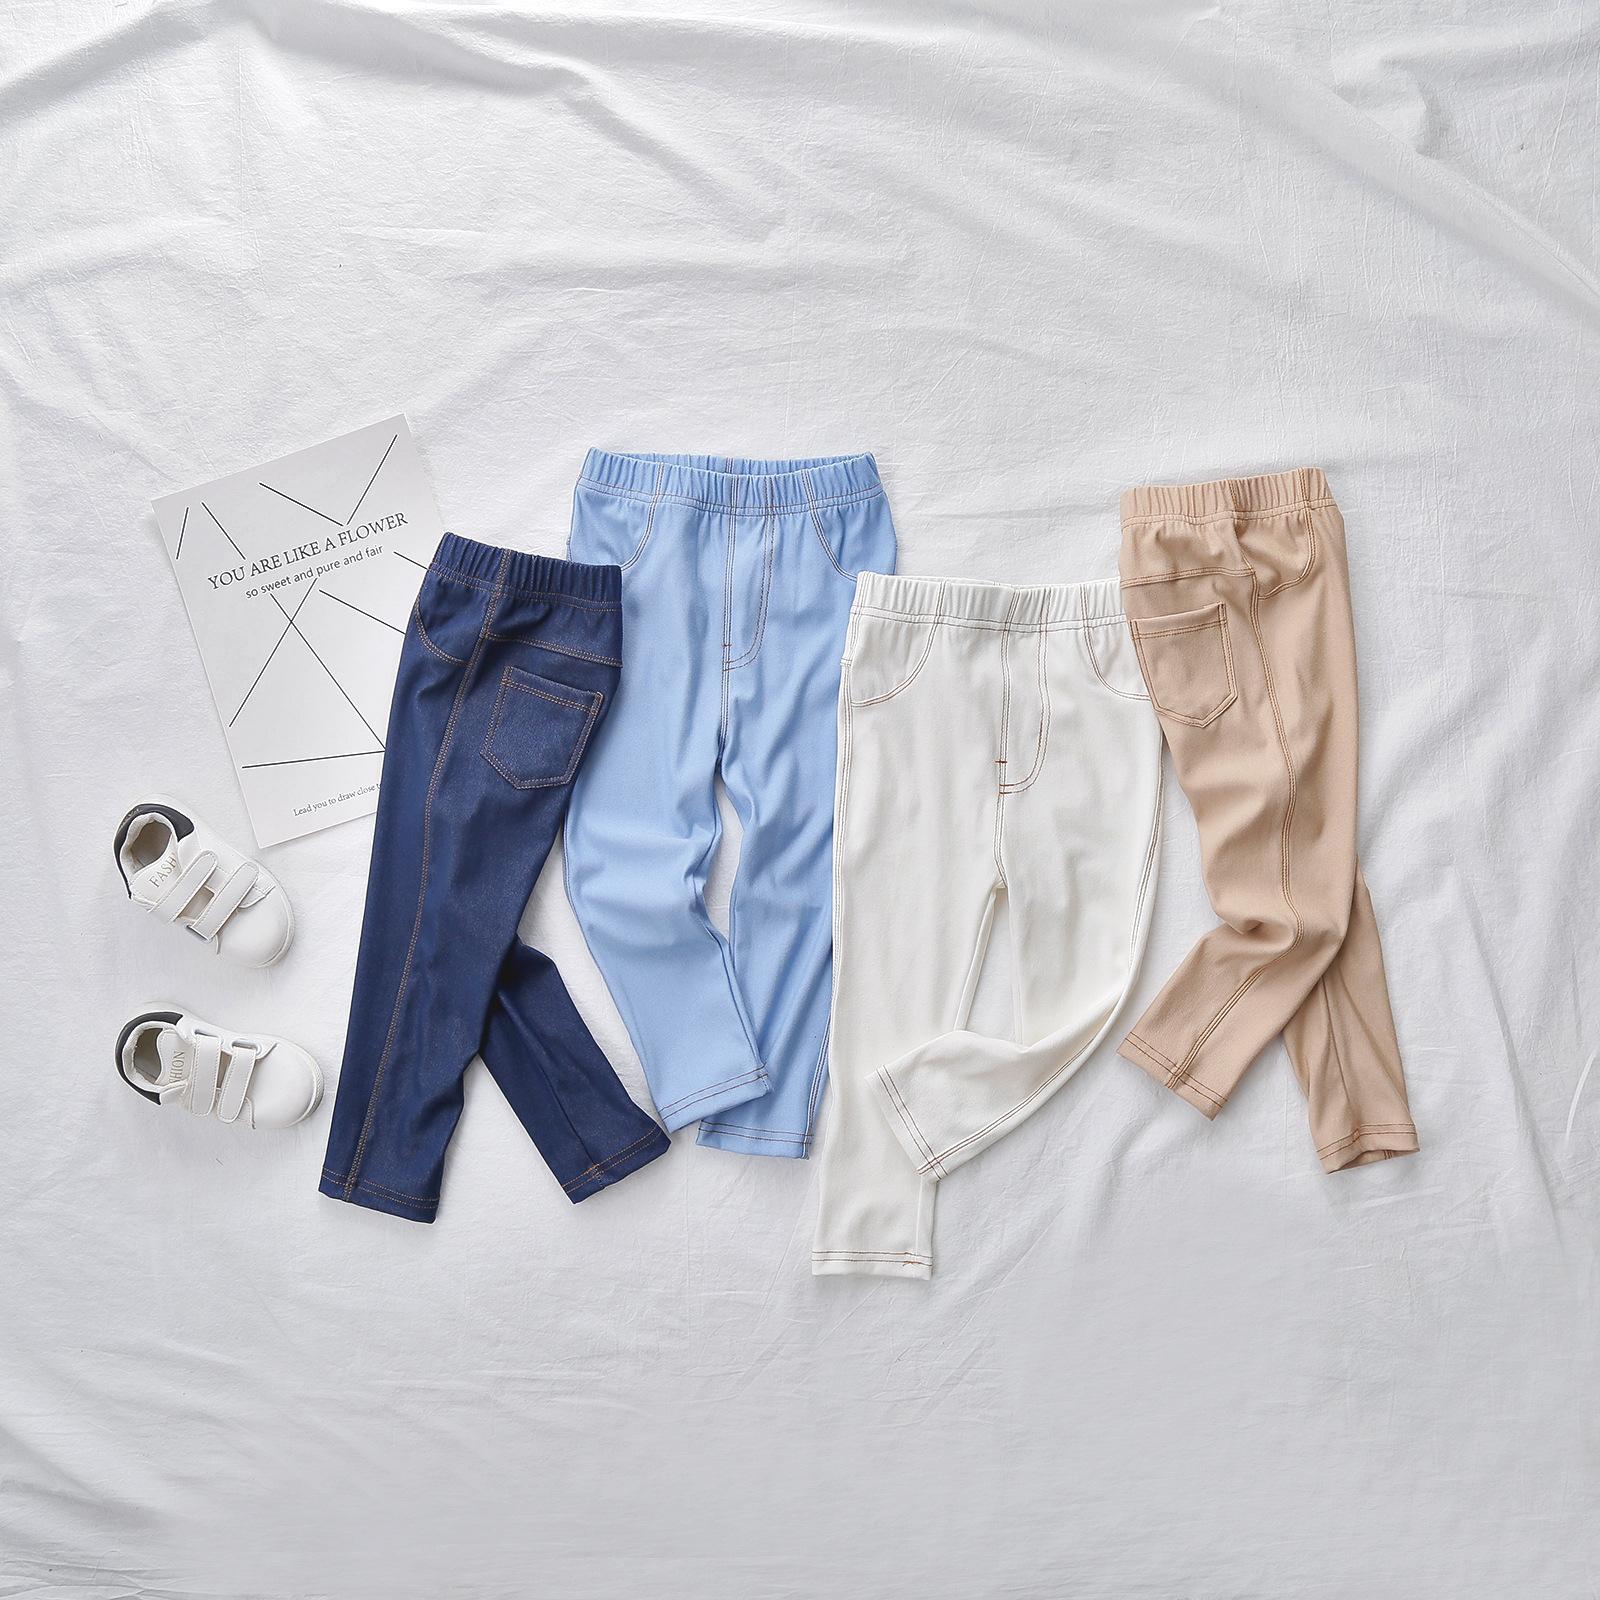 e0fe4b13e2b New Autumn Baby Pants Soft Cotton Baby Boy Pants Solid All Matched Girls  Trousers White Blue Denim Girl Leggings Boys Legging Kids Brown Pants Youth  Hiking ...